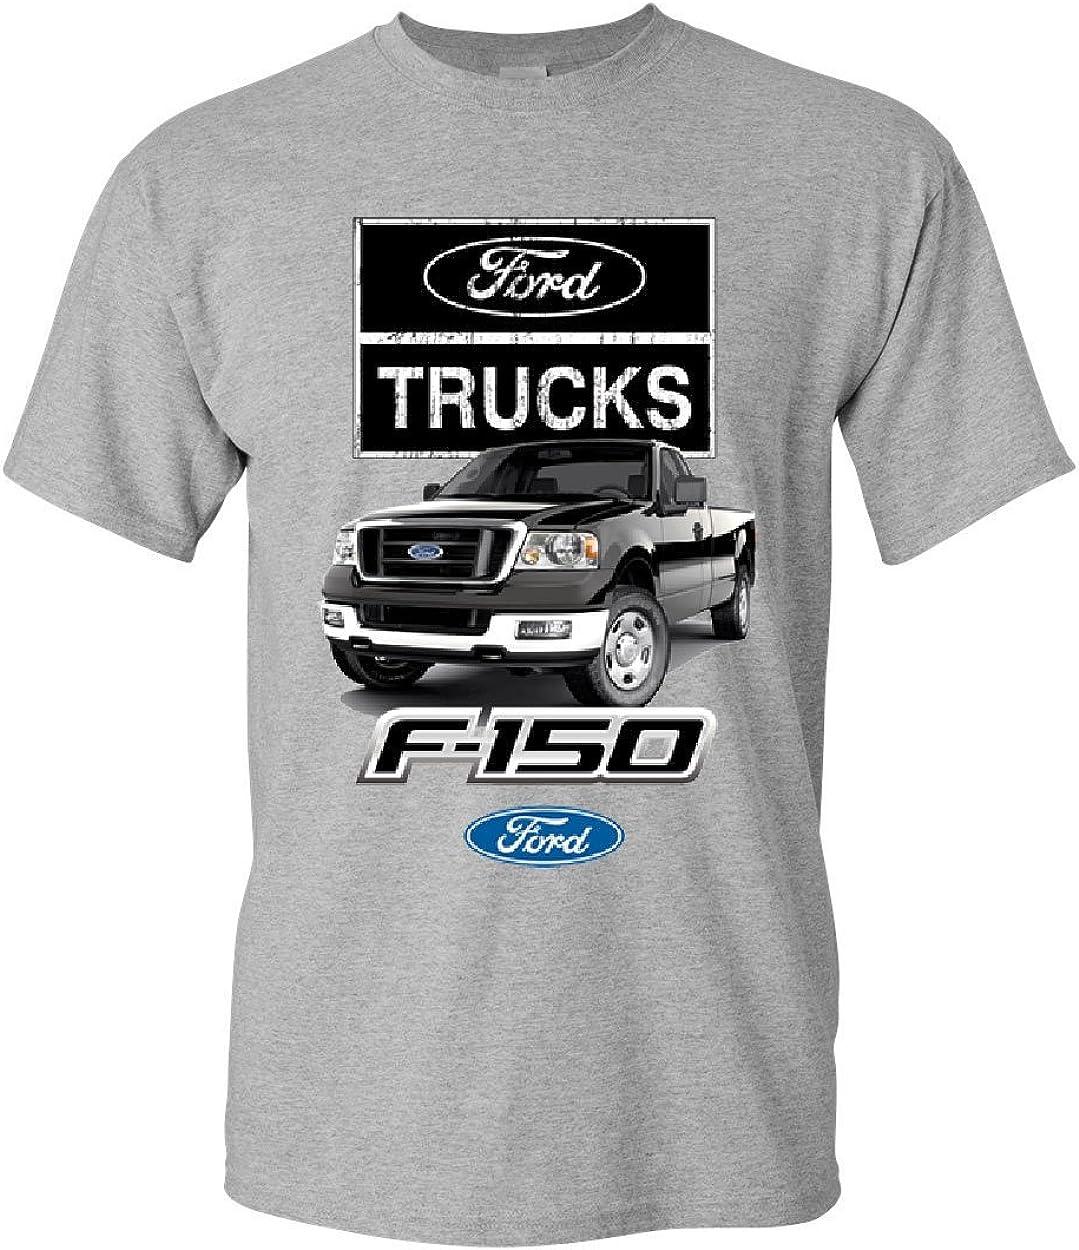 Ford Pickup Trucks F-150 T-Shirt Offroad Country Built Tough 4X4 Mens Tee Shirt